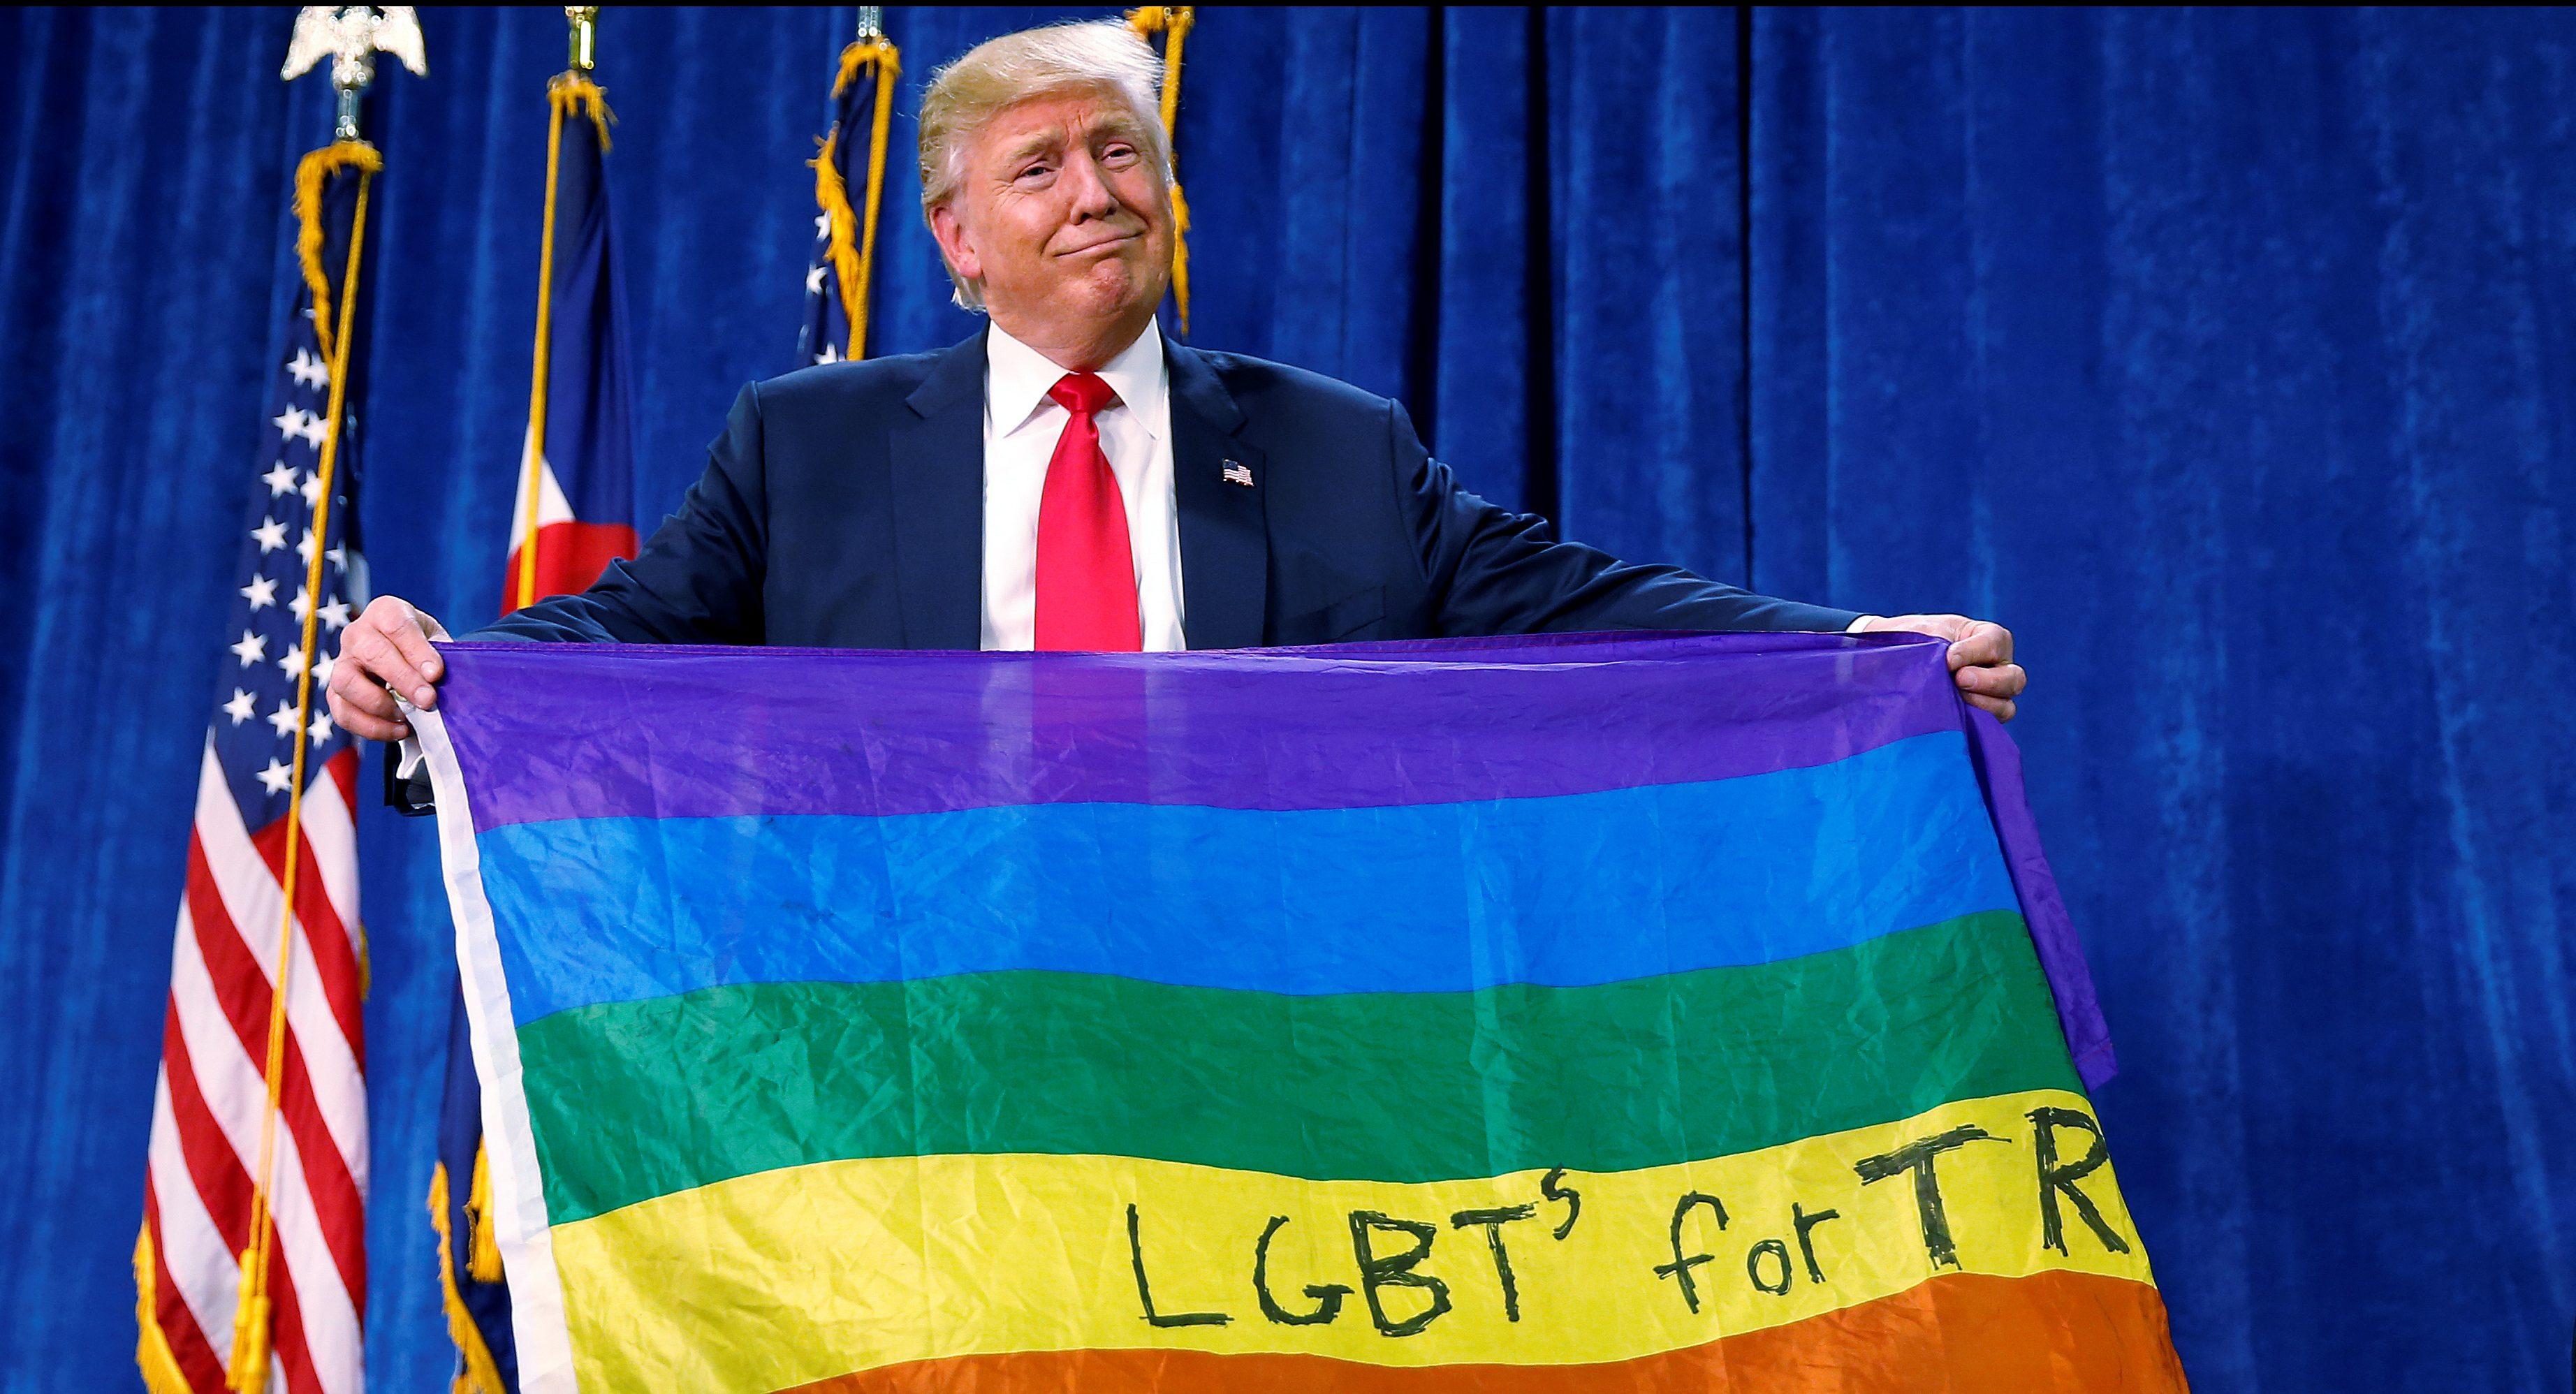 Trumps gays